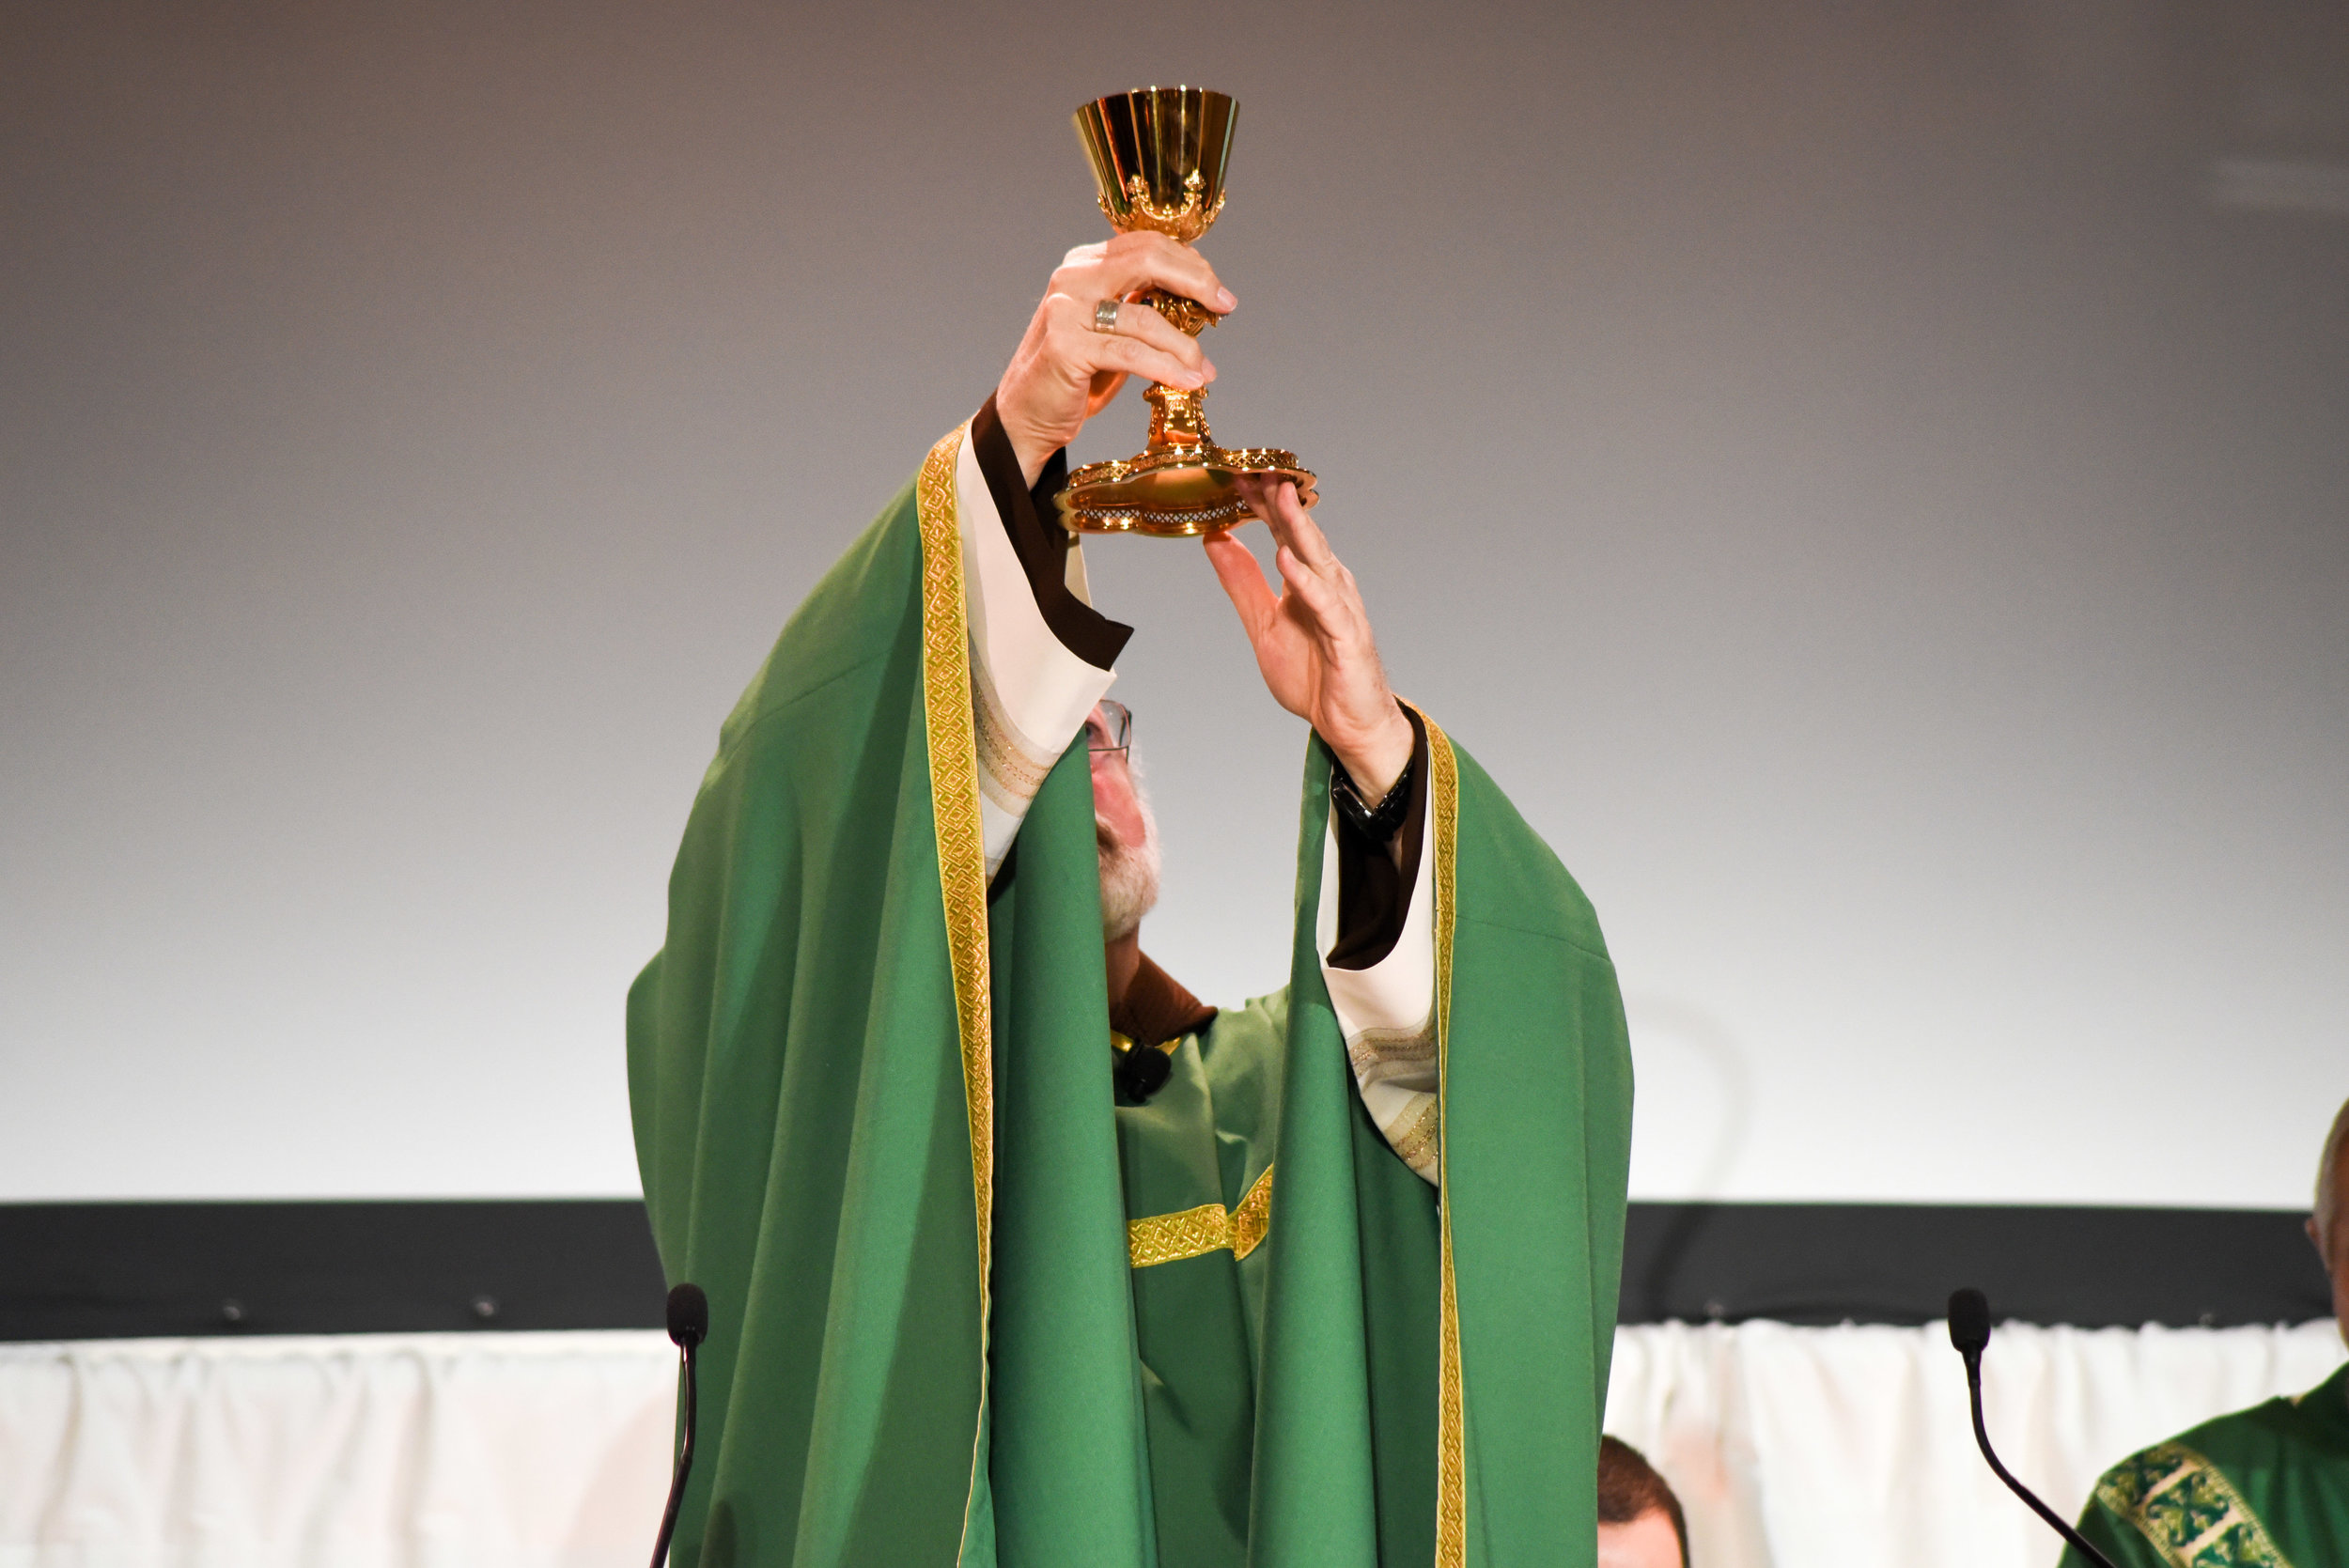 holy-mass-celebrated-by-sen-cardinal-patrick-omalley-ofm-cap-archbishop-of-boston_38984330404_o.jpg